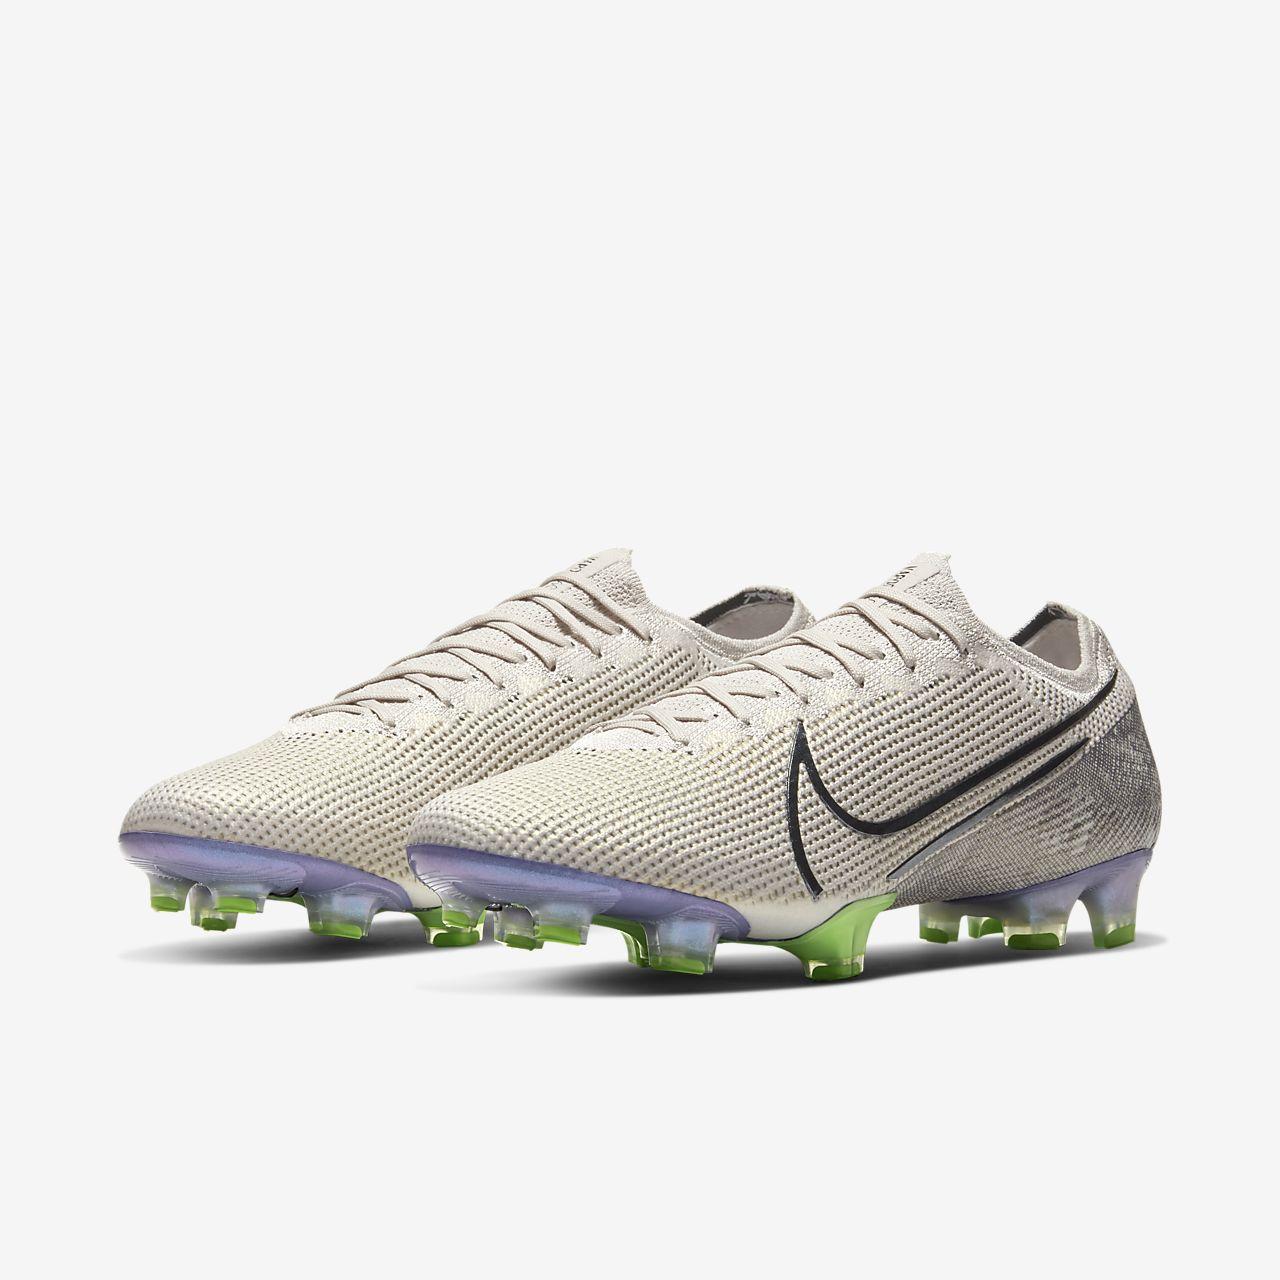 Nike Jr. Phantom 3 Elite Dynamic Fit FG Ultra Football